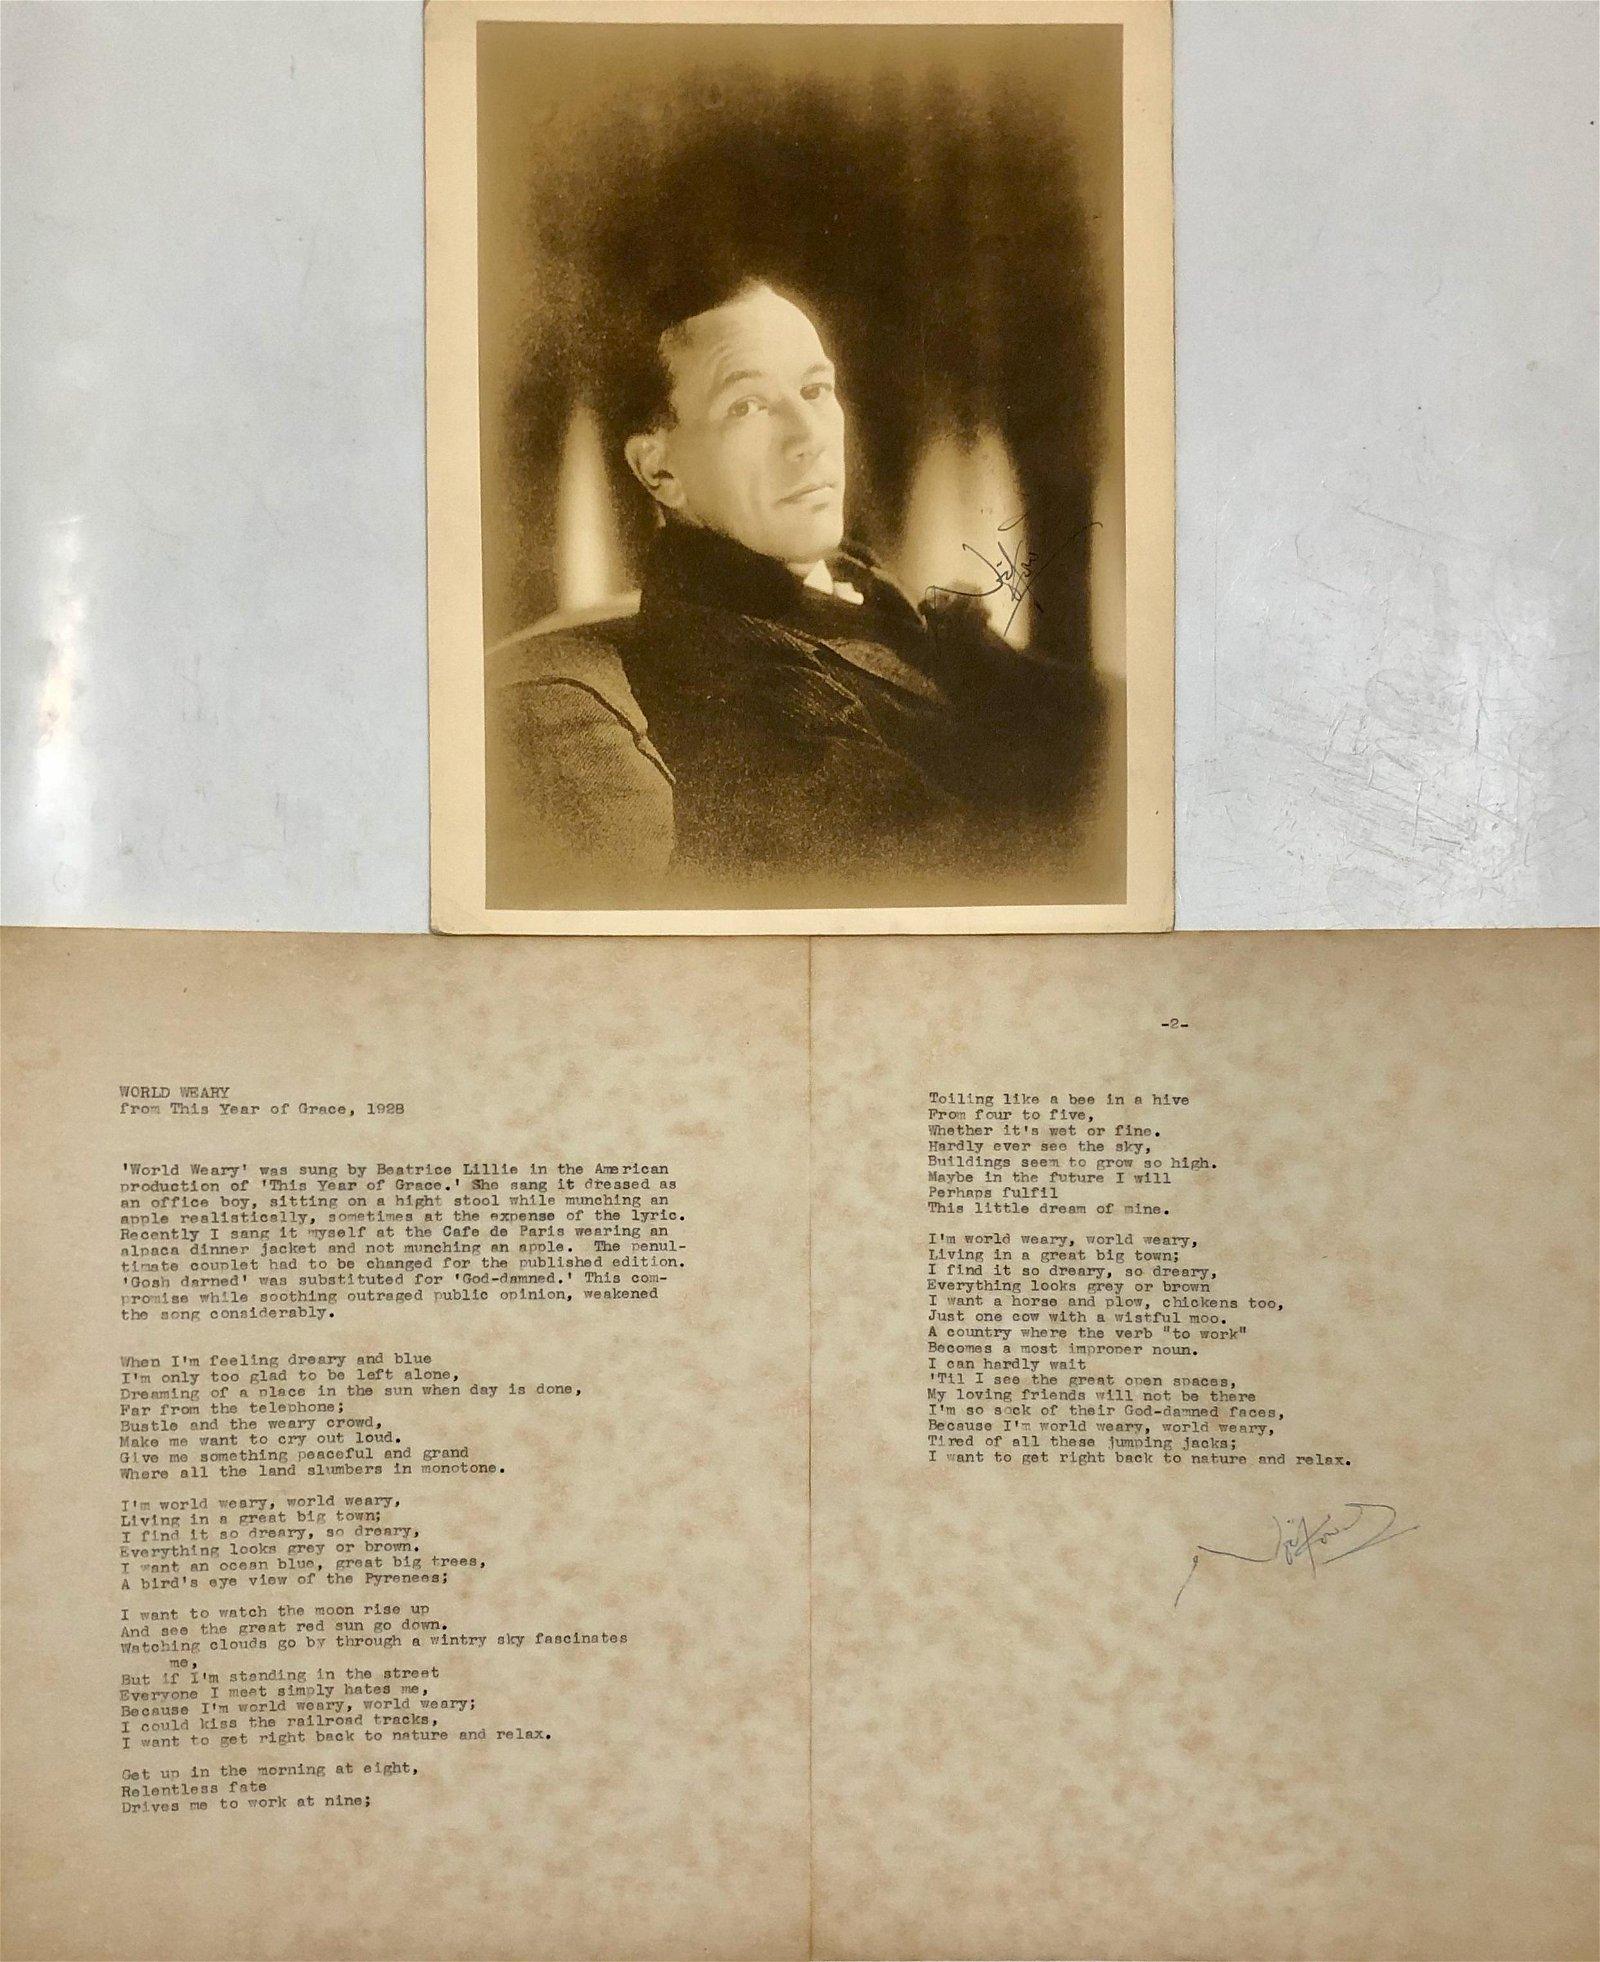 Noel Coward Inscribed Photograph & World Weary Lyrics